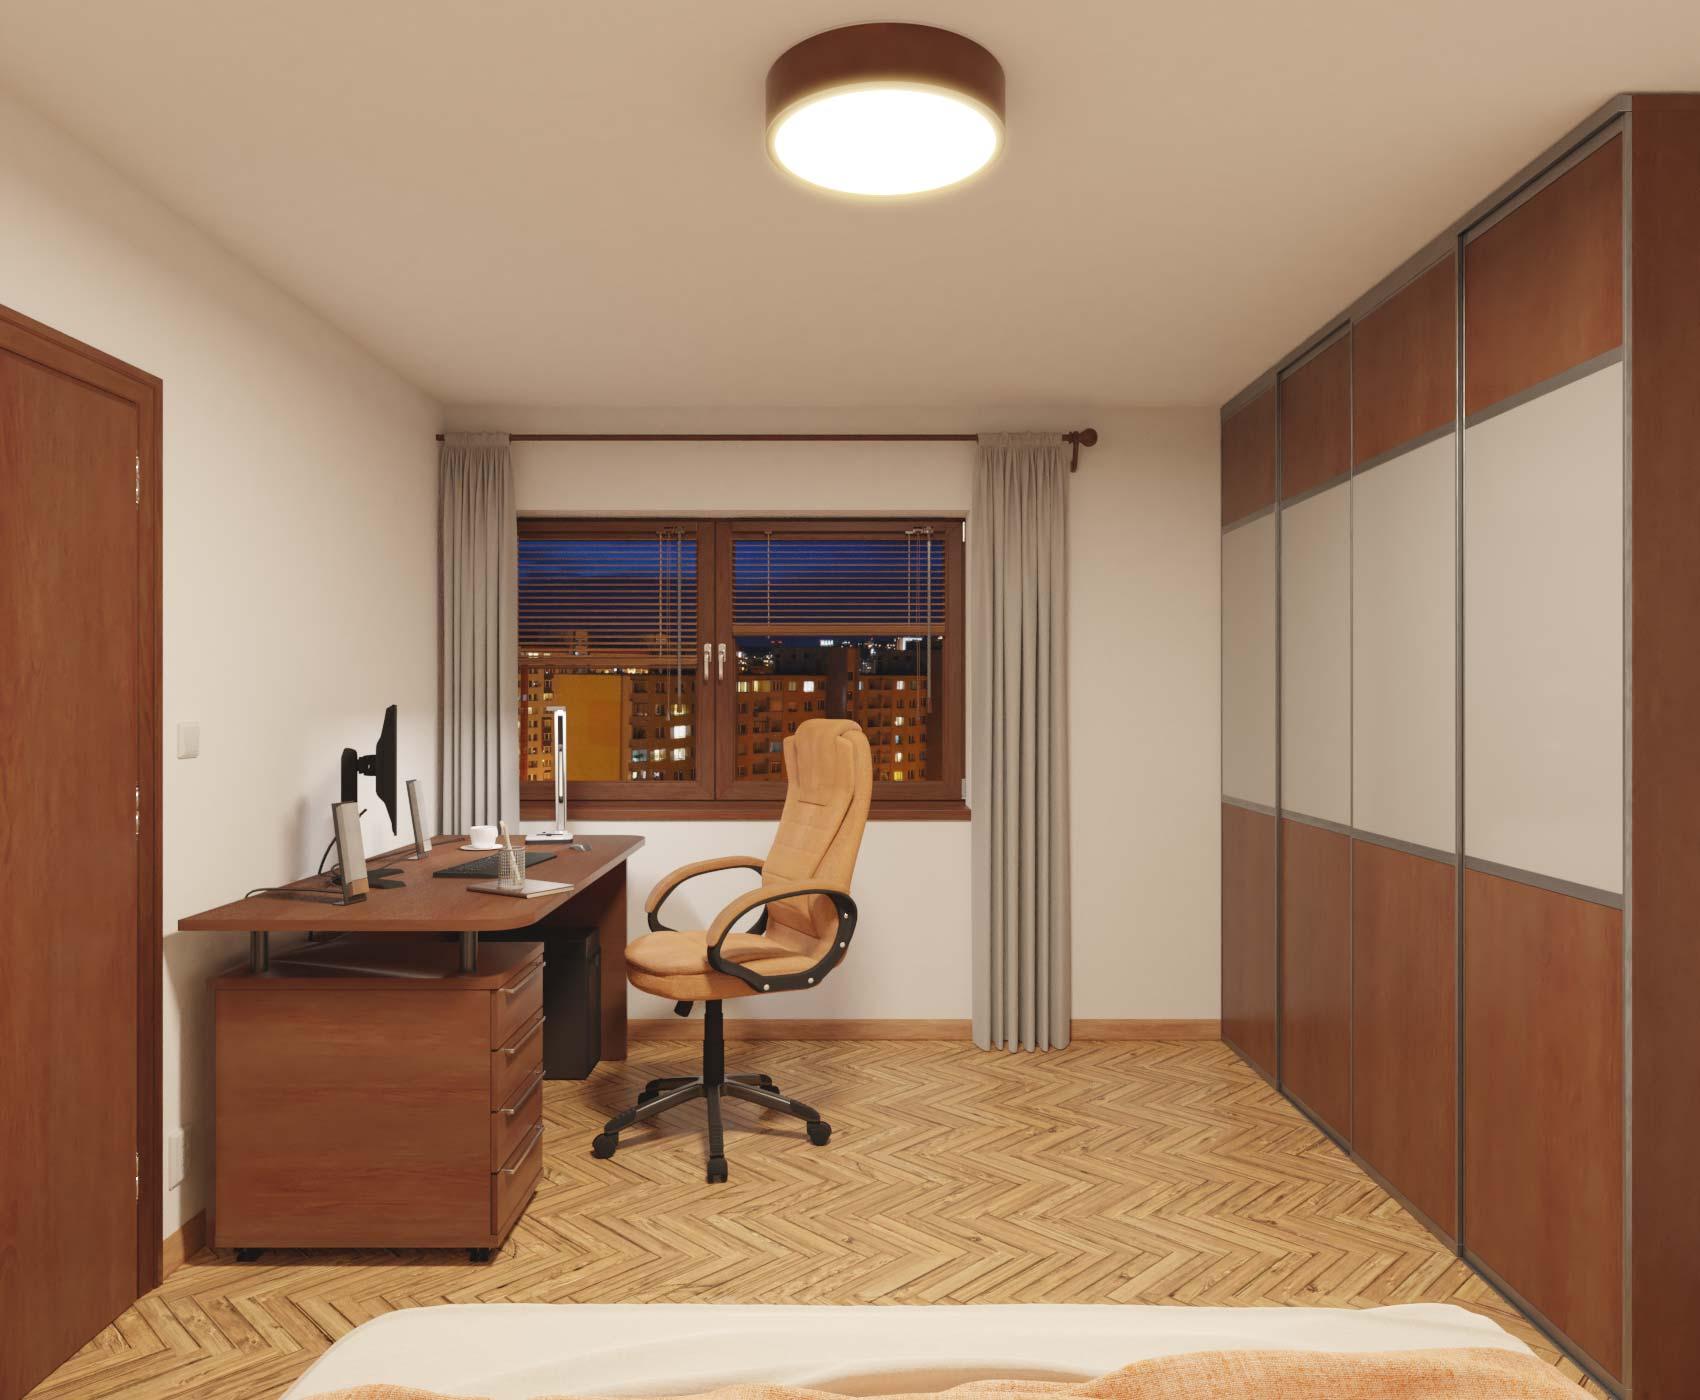 idea3d - vizualizácia spálňa 3